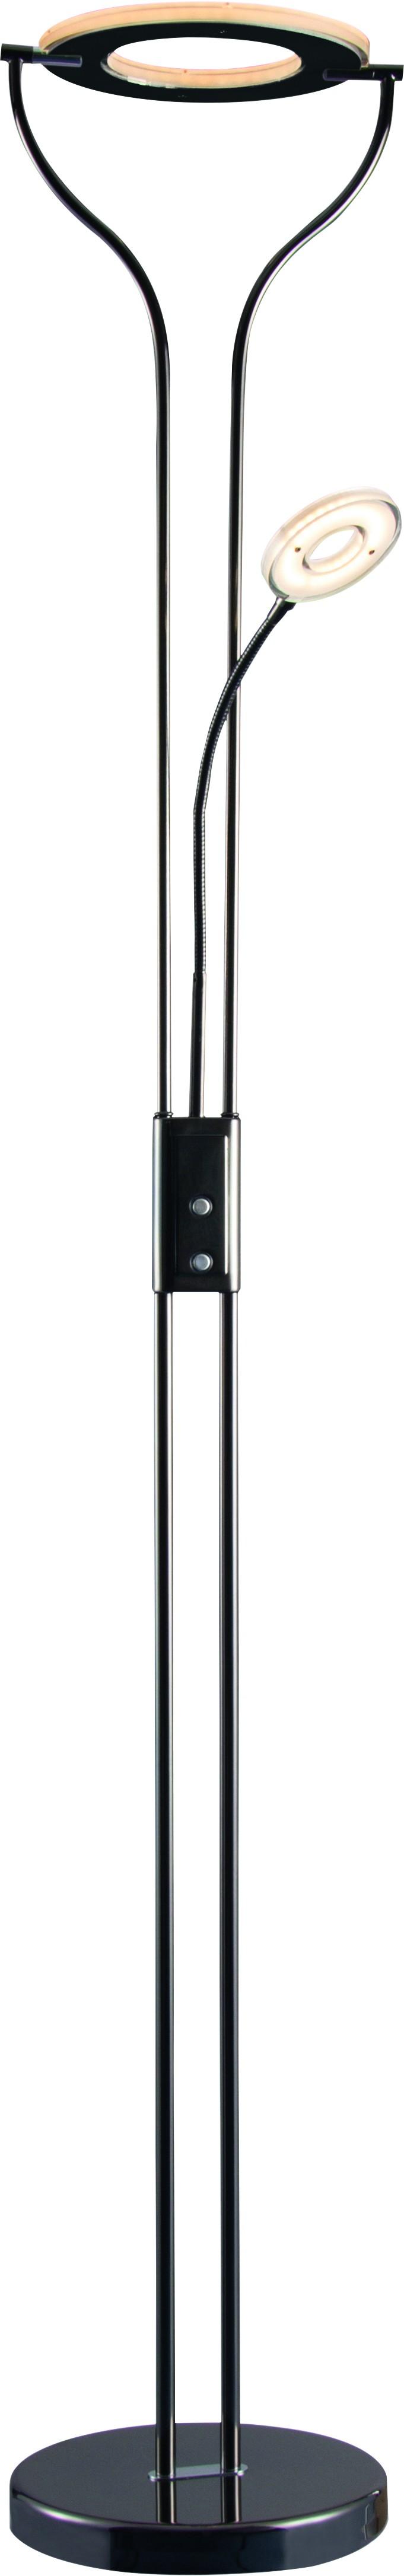 Торшер Arte lamp A5904pn-2bc